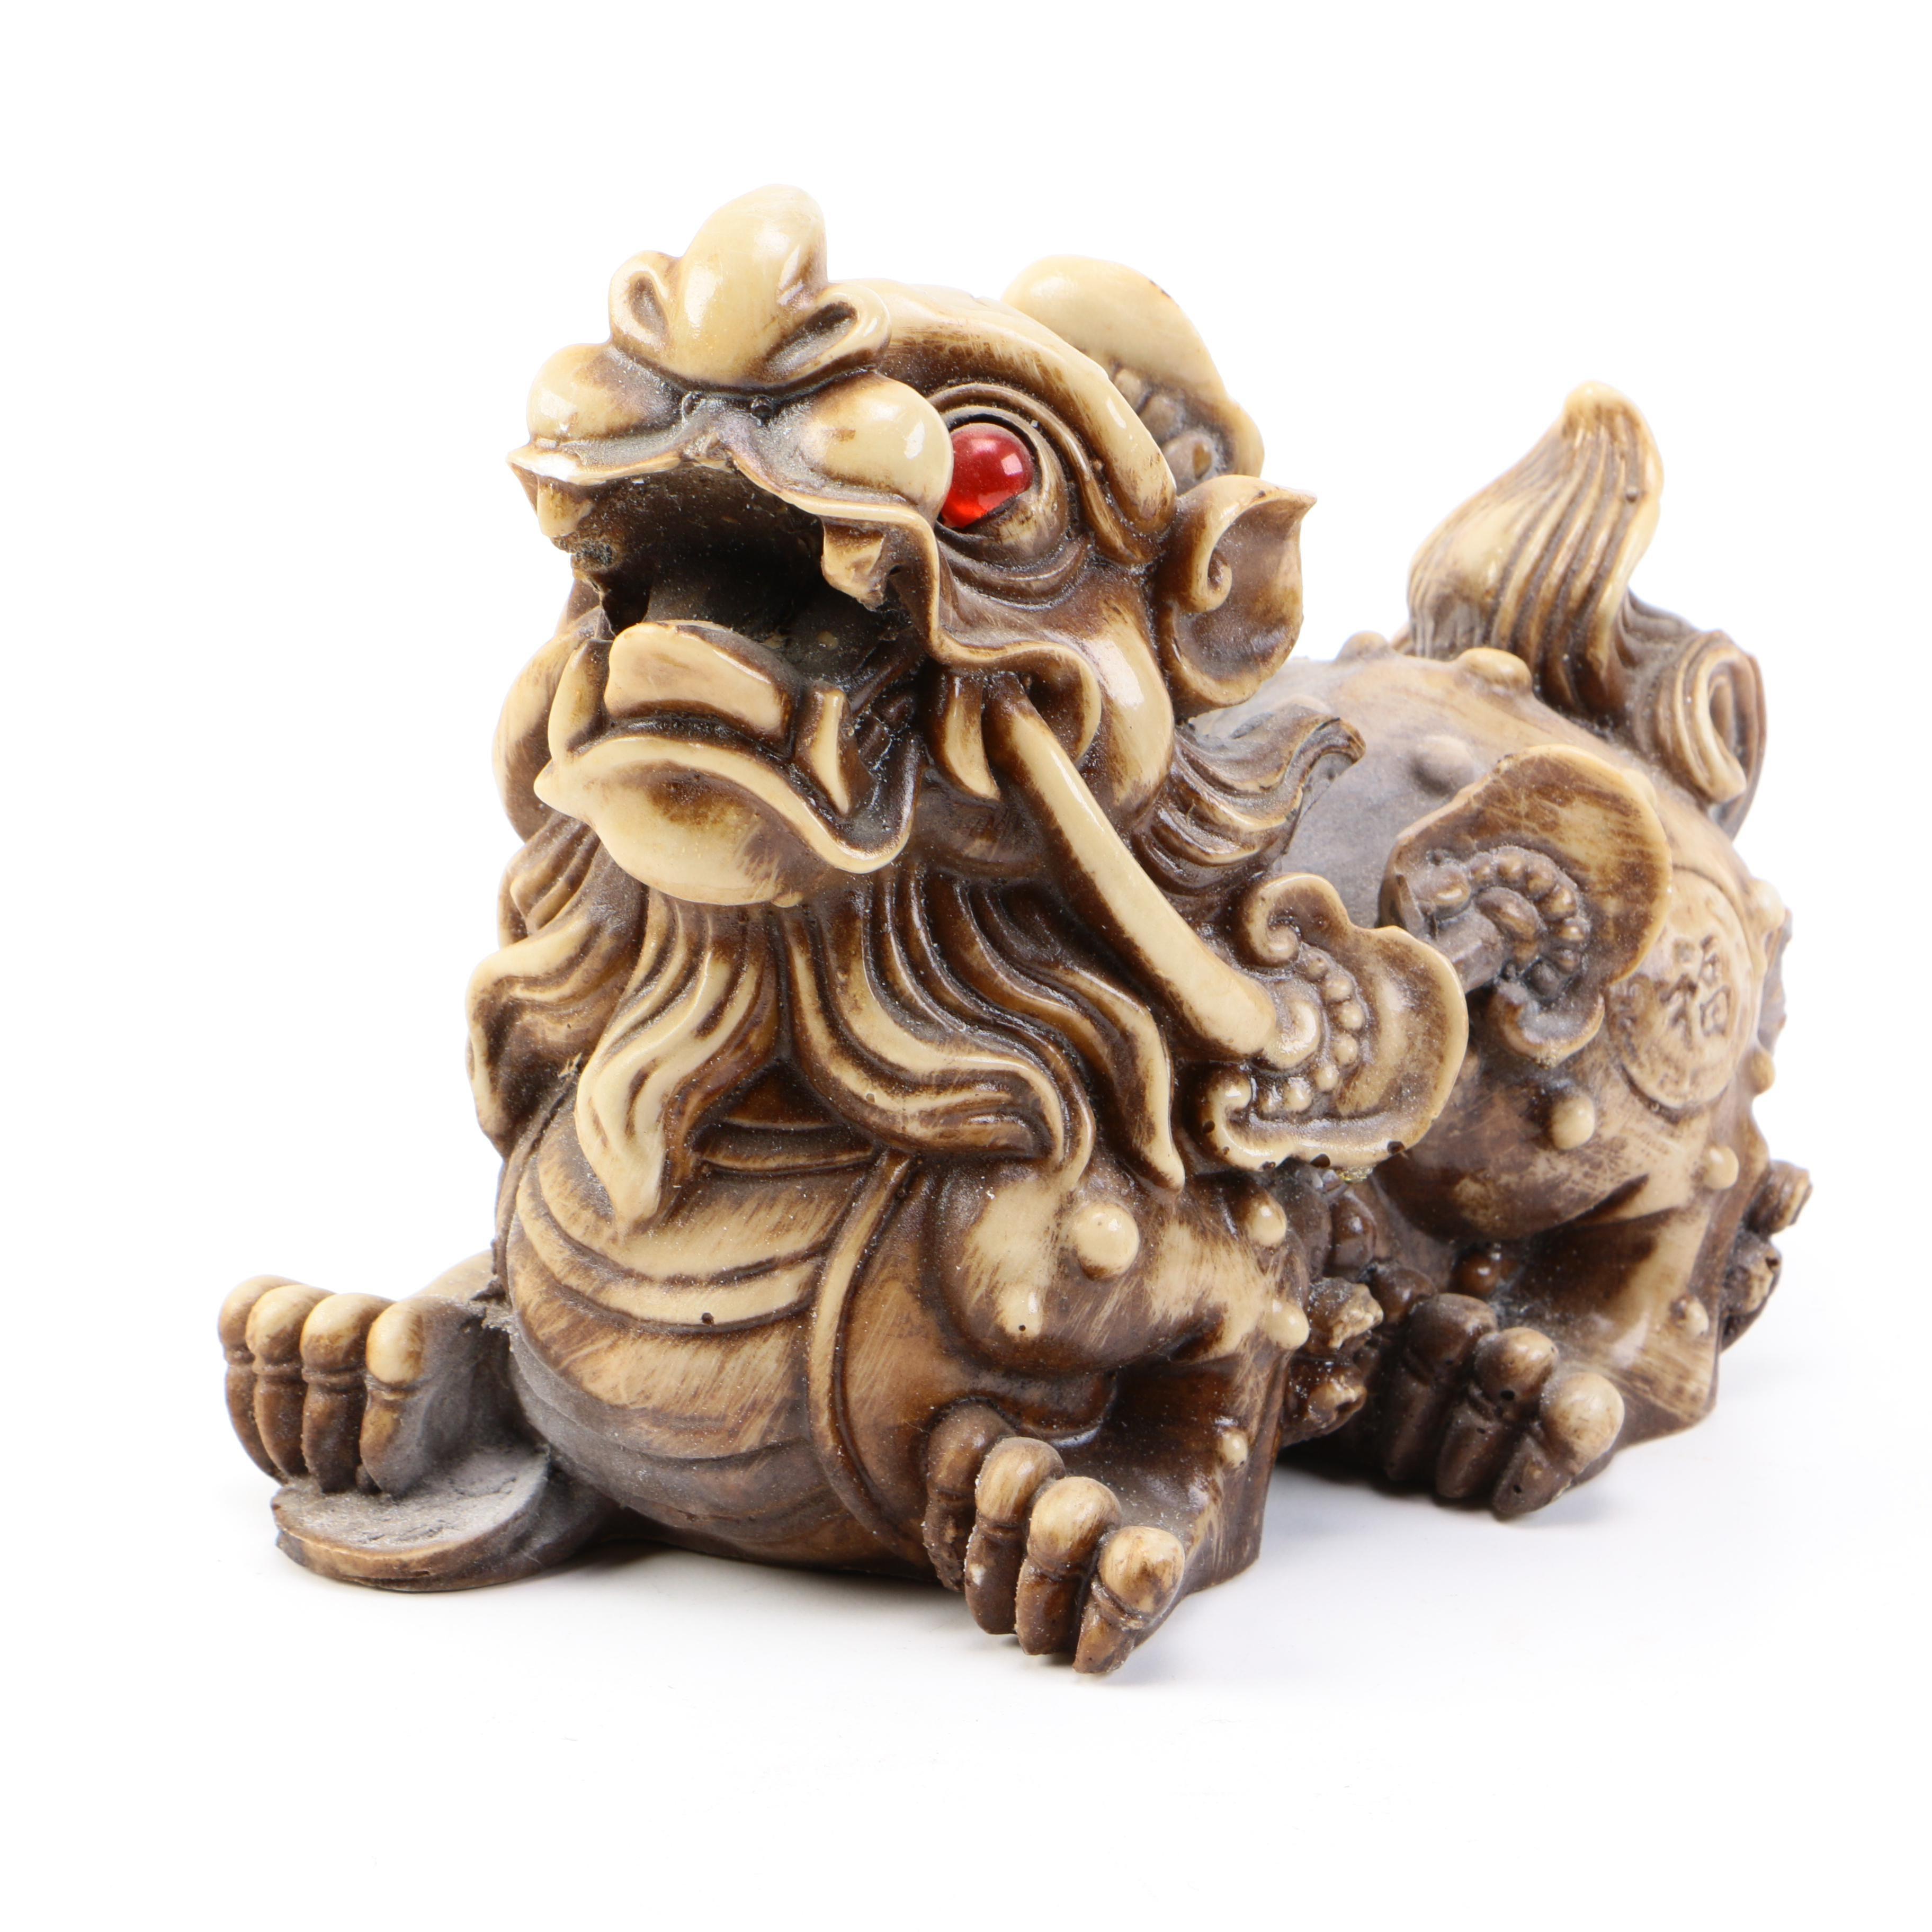 Chinese Ceramic Dragon Sculpture